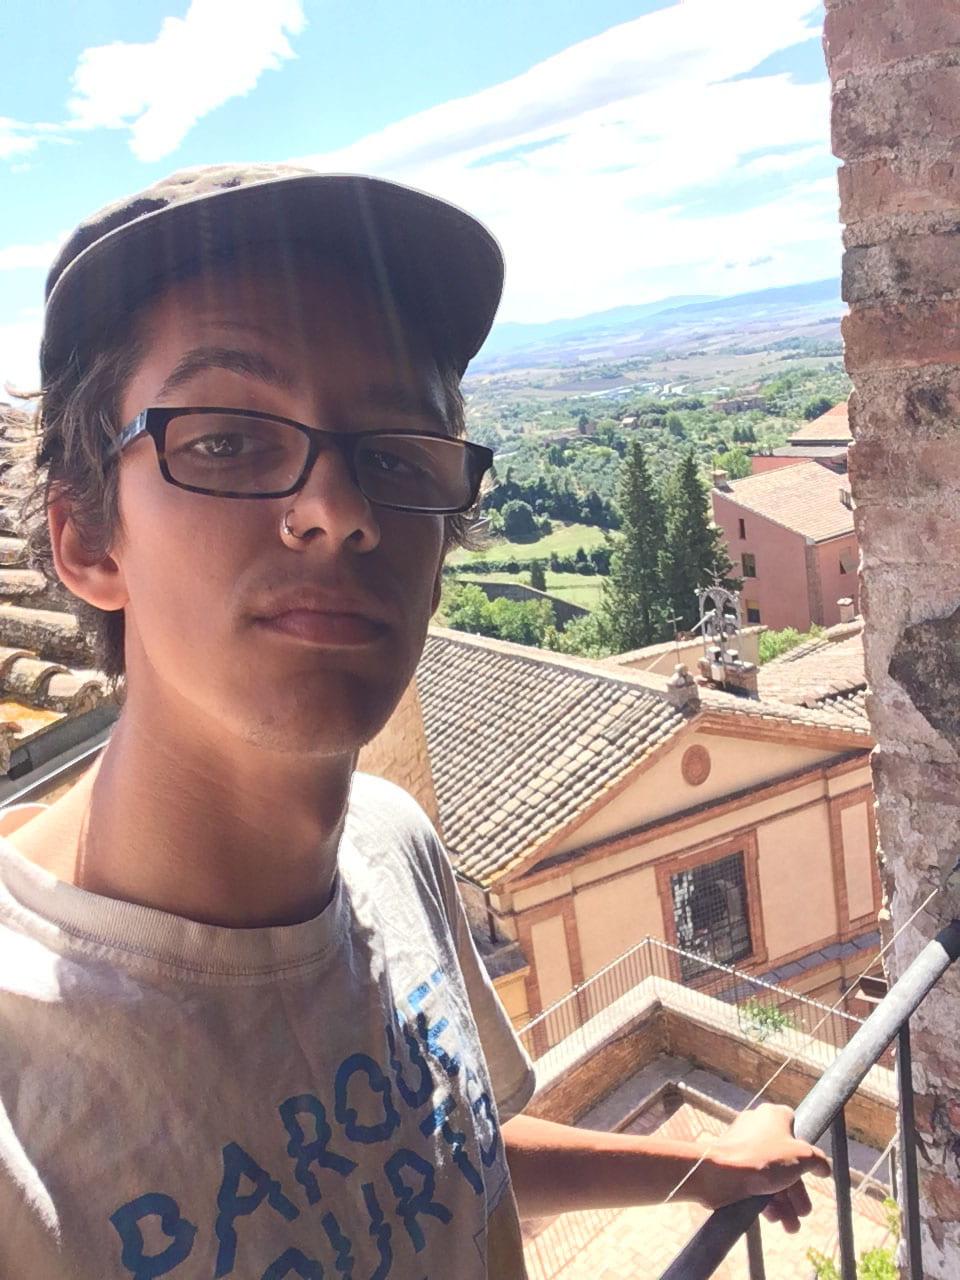 Brian in Siena